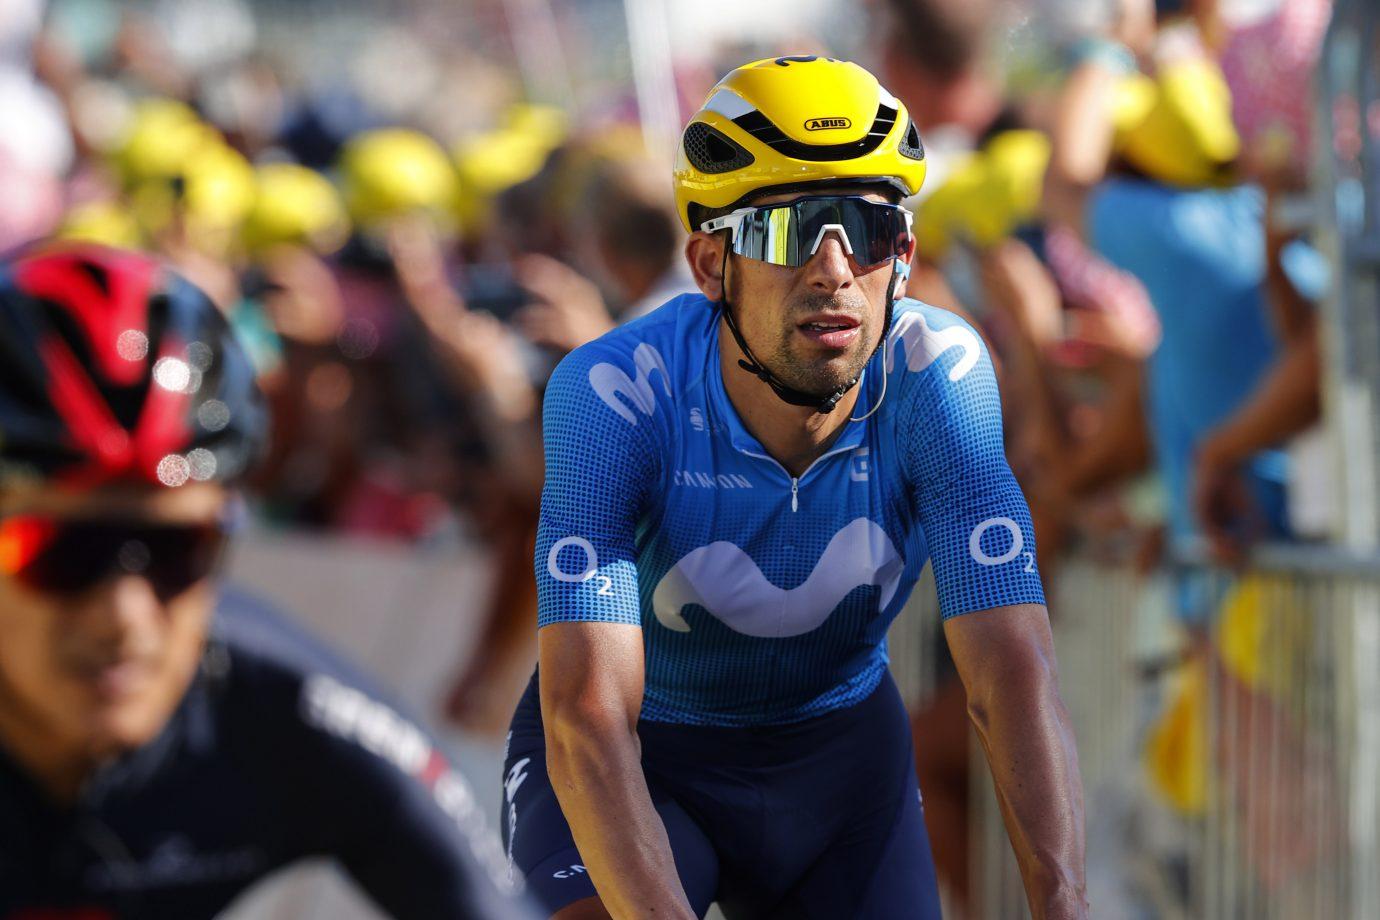 Imagen de la noticia 'Blues' team strength gets over stressful day towards Ré'